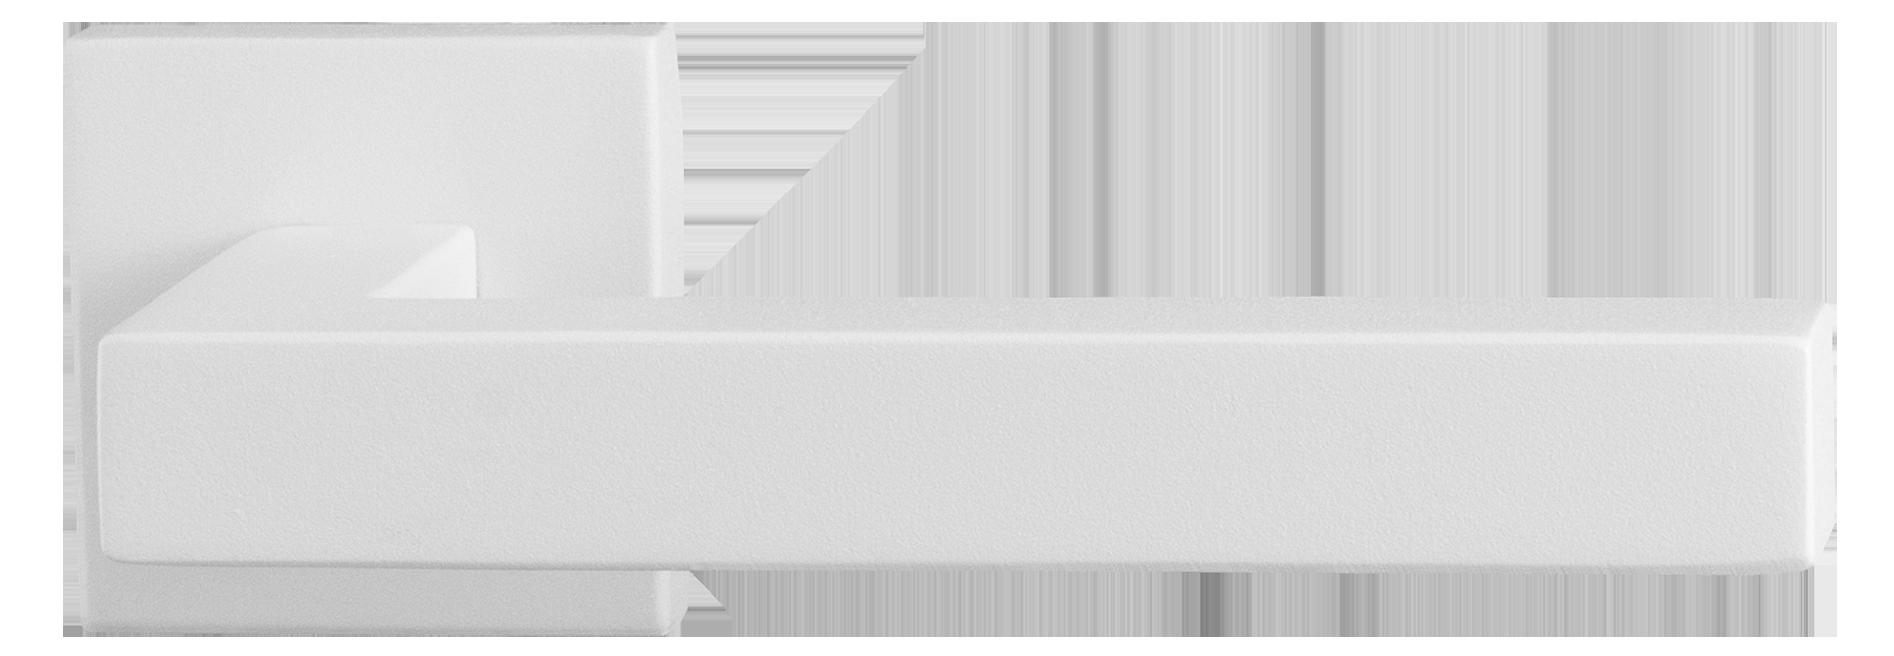 GPF wit deurkruk